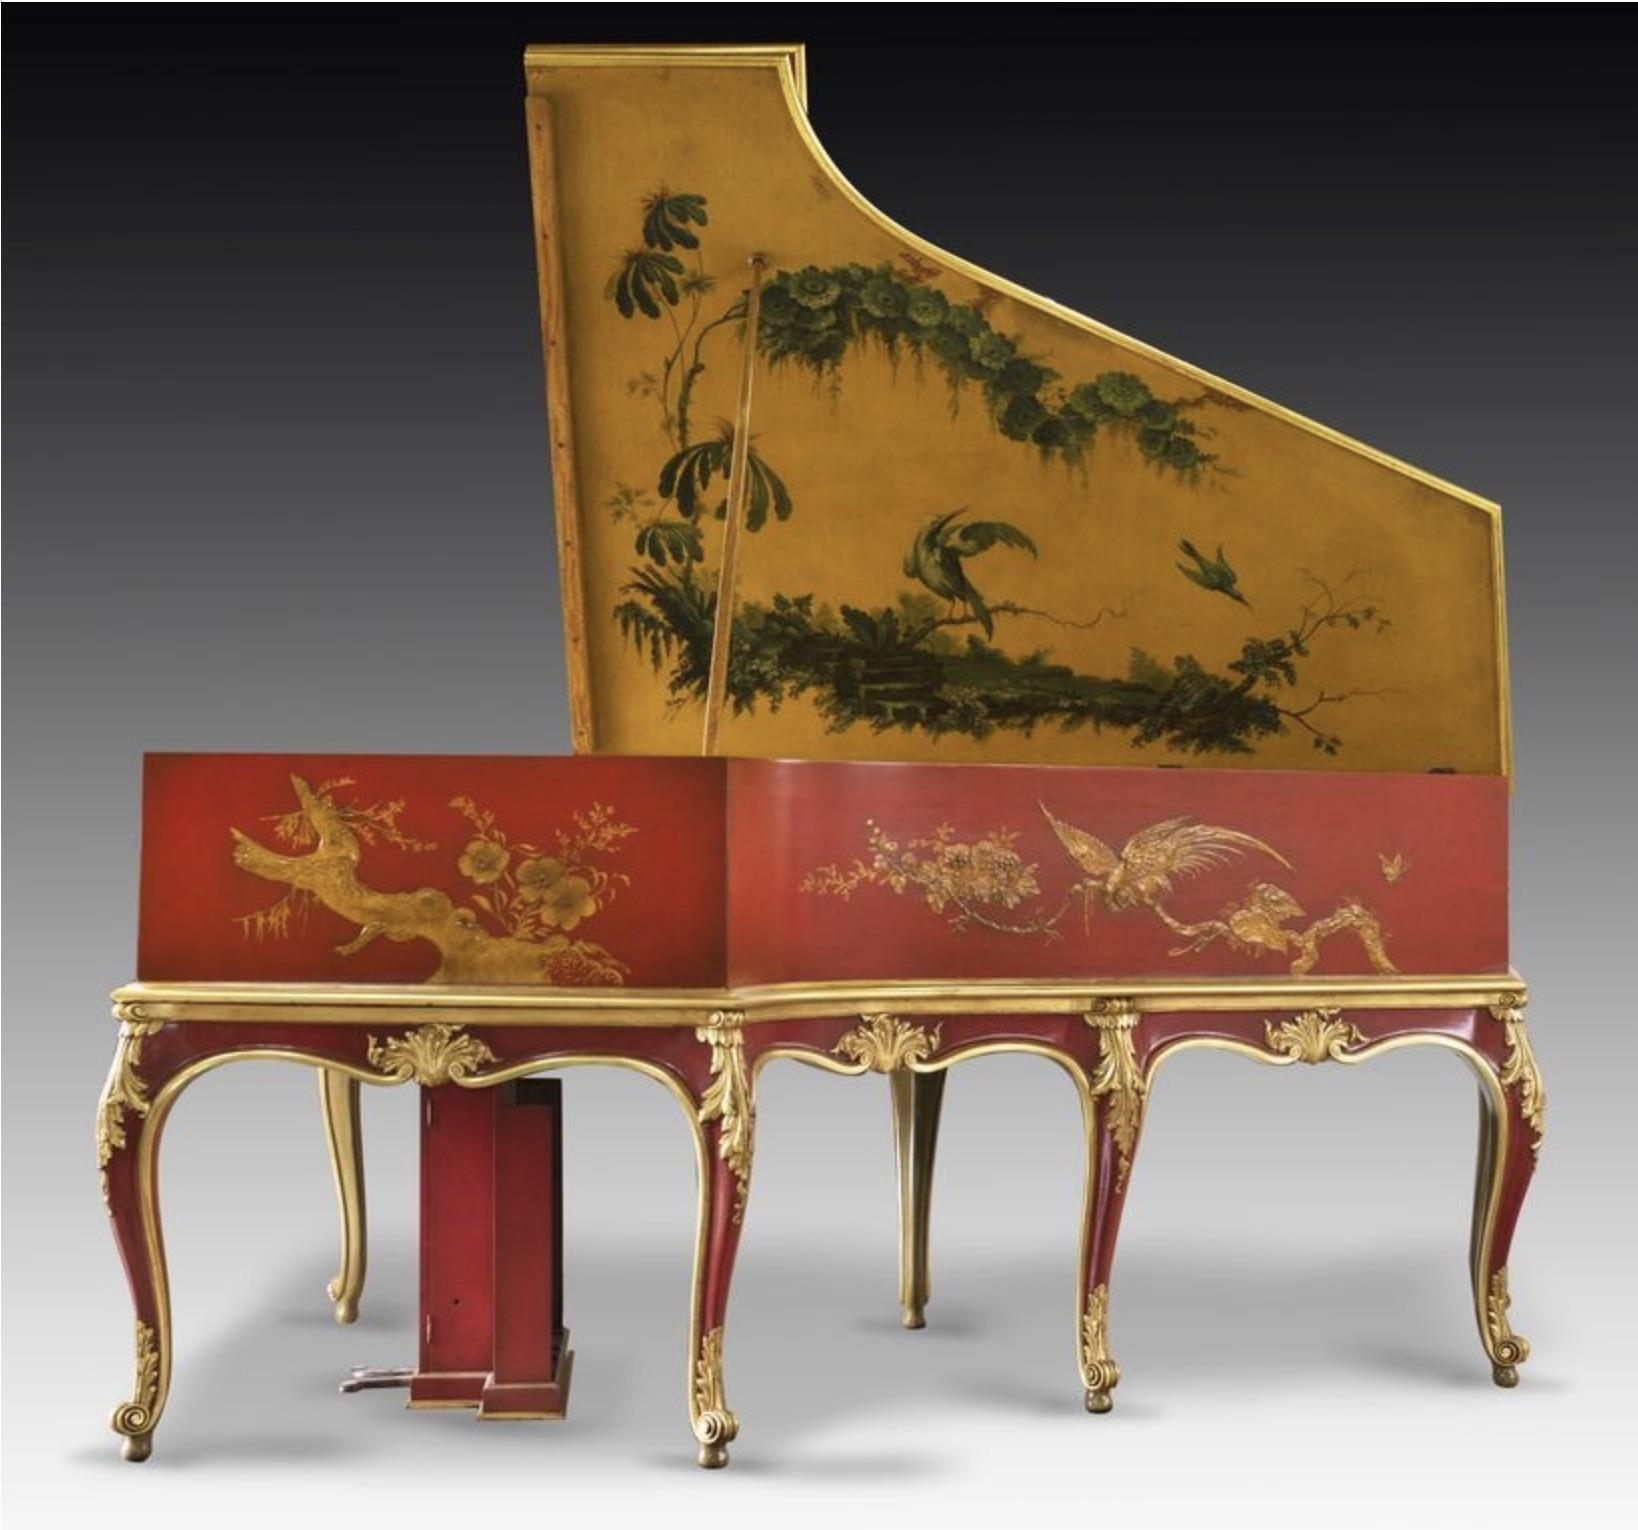 A rare chinoiserie cased 'Auto Pleyela' grand piano by Pleyel, Paris, 1925